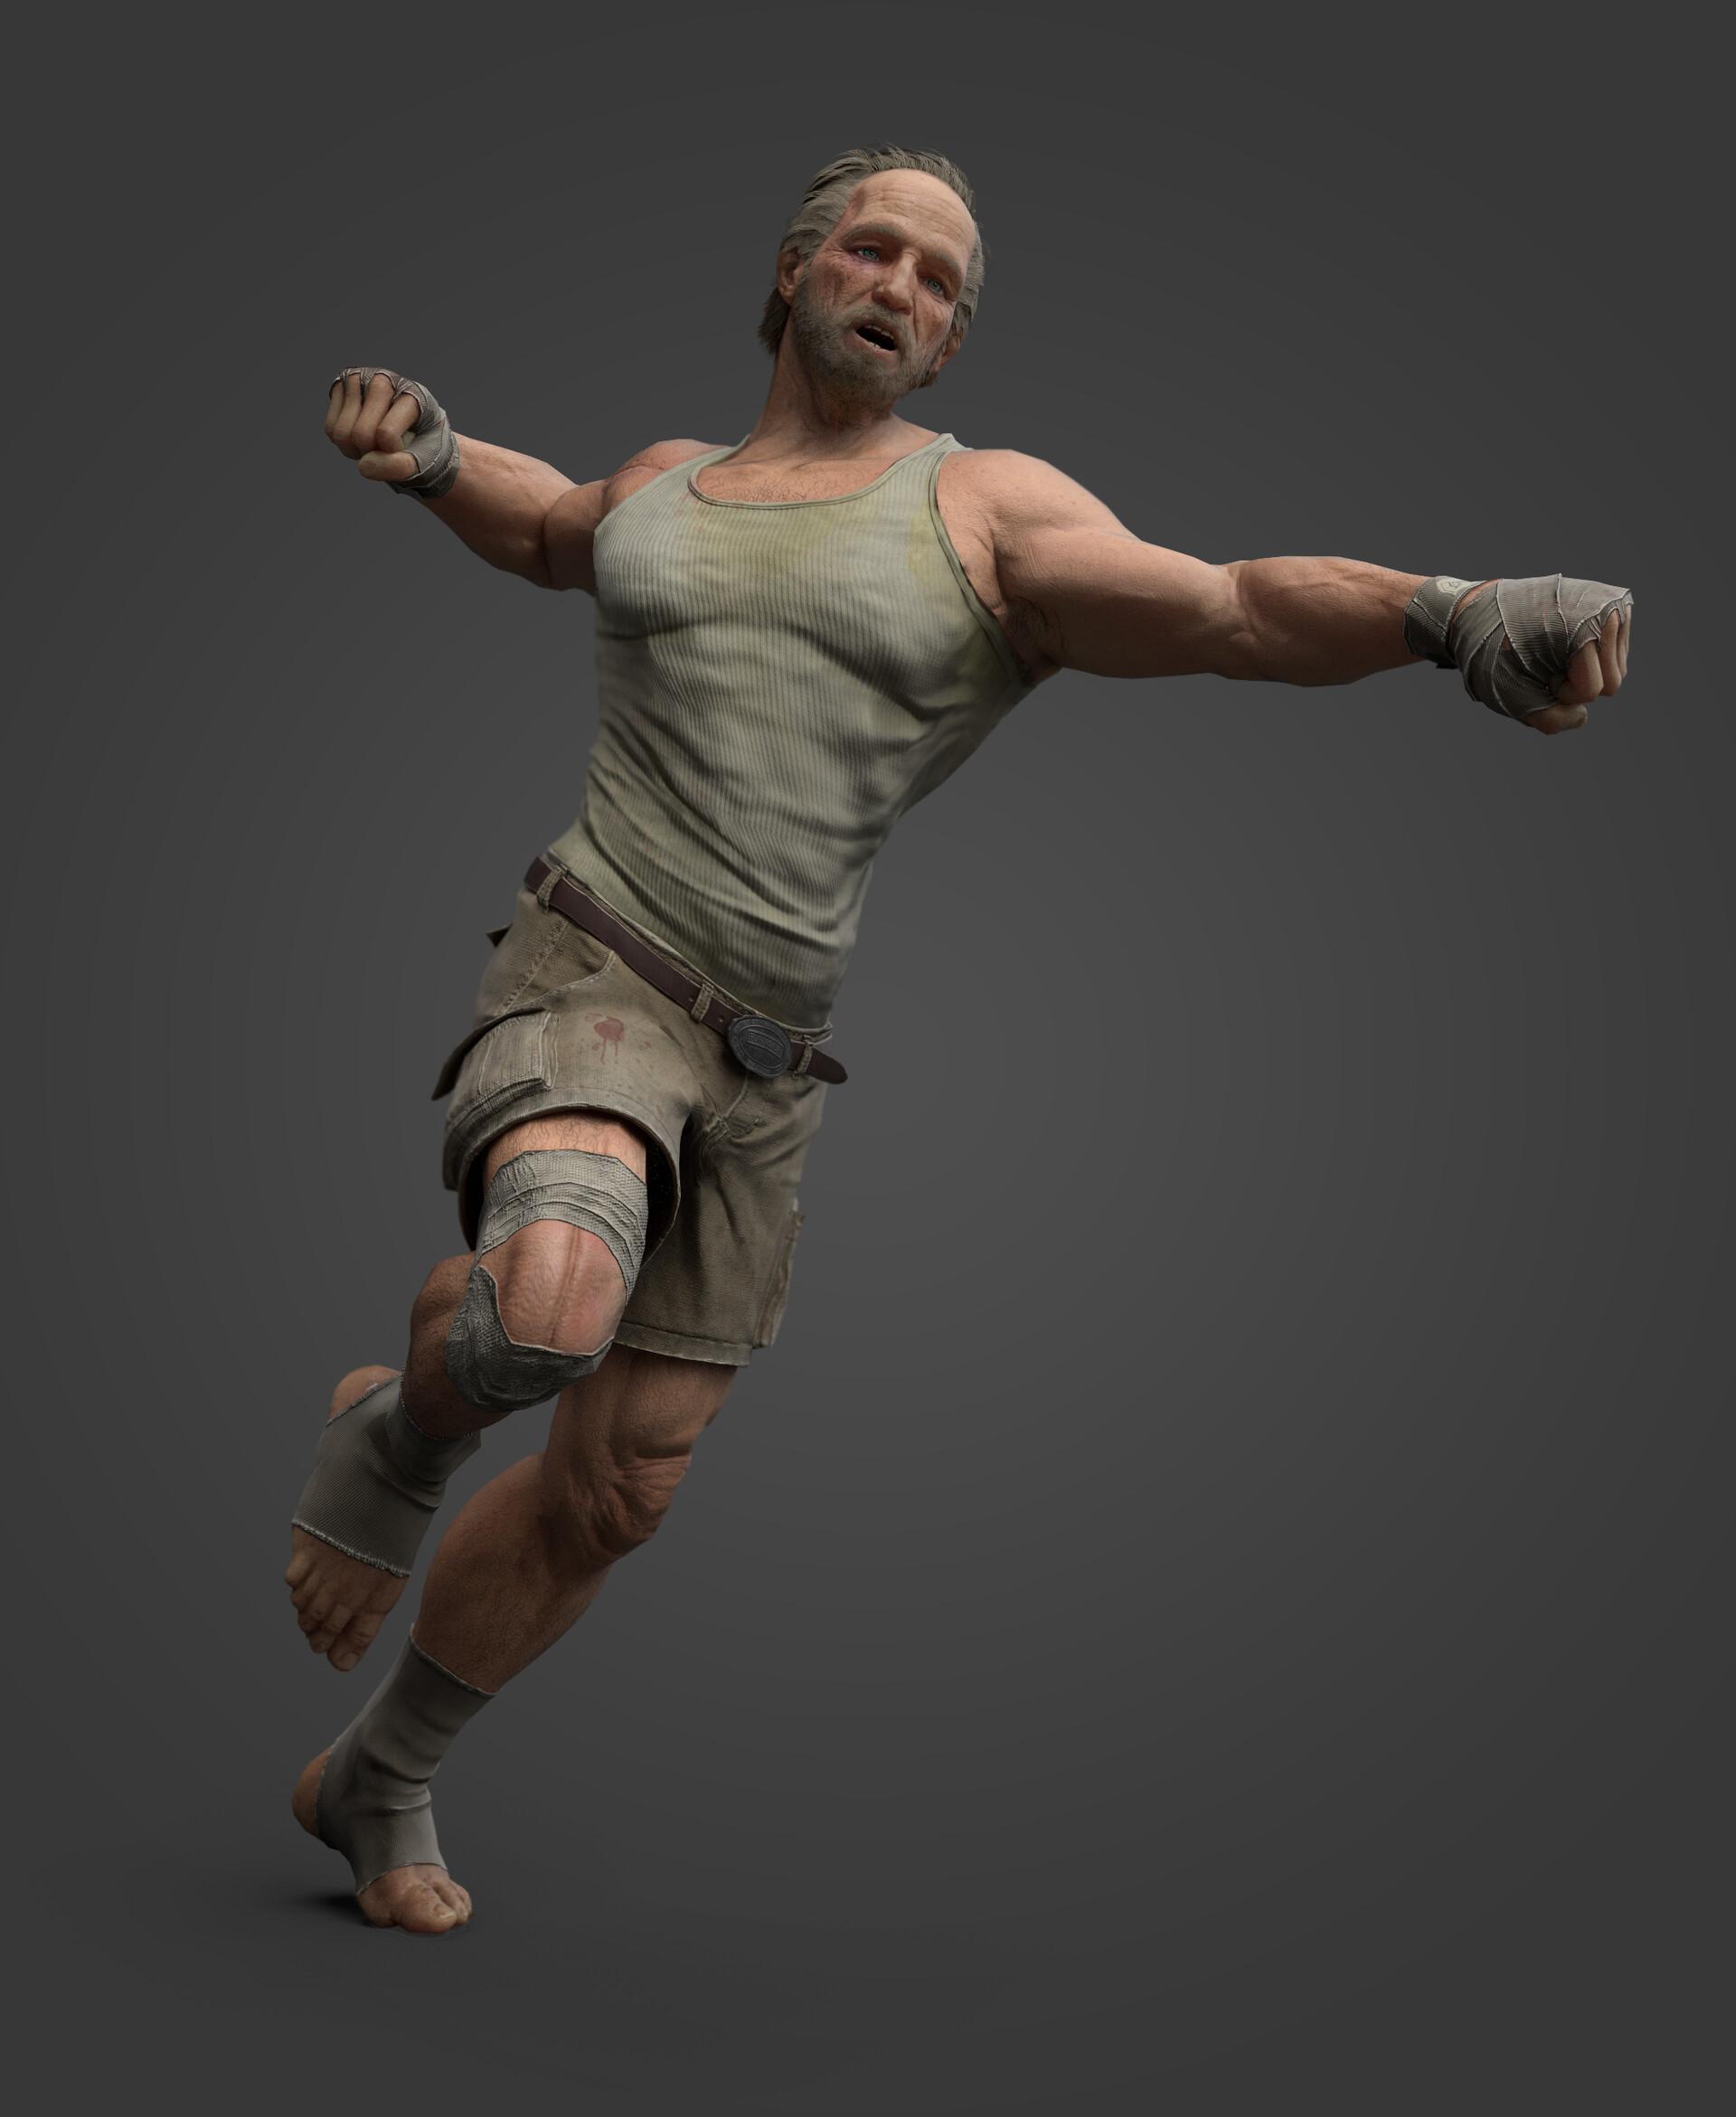 Dave viola fighter punch01